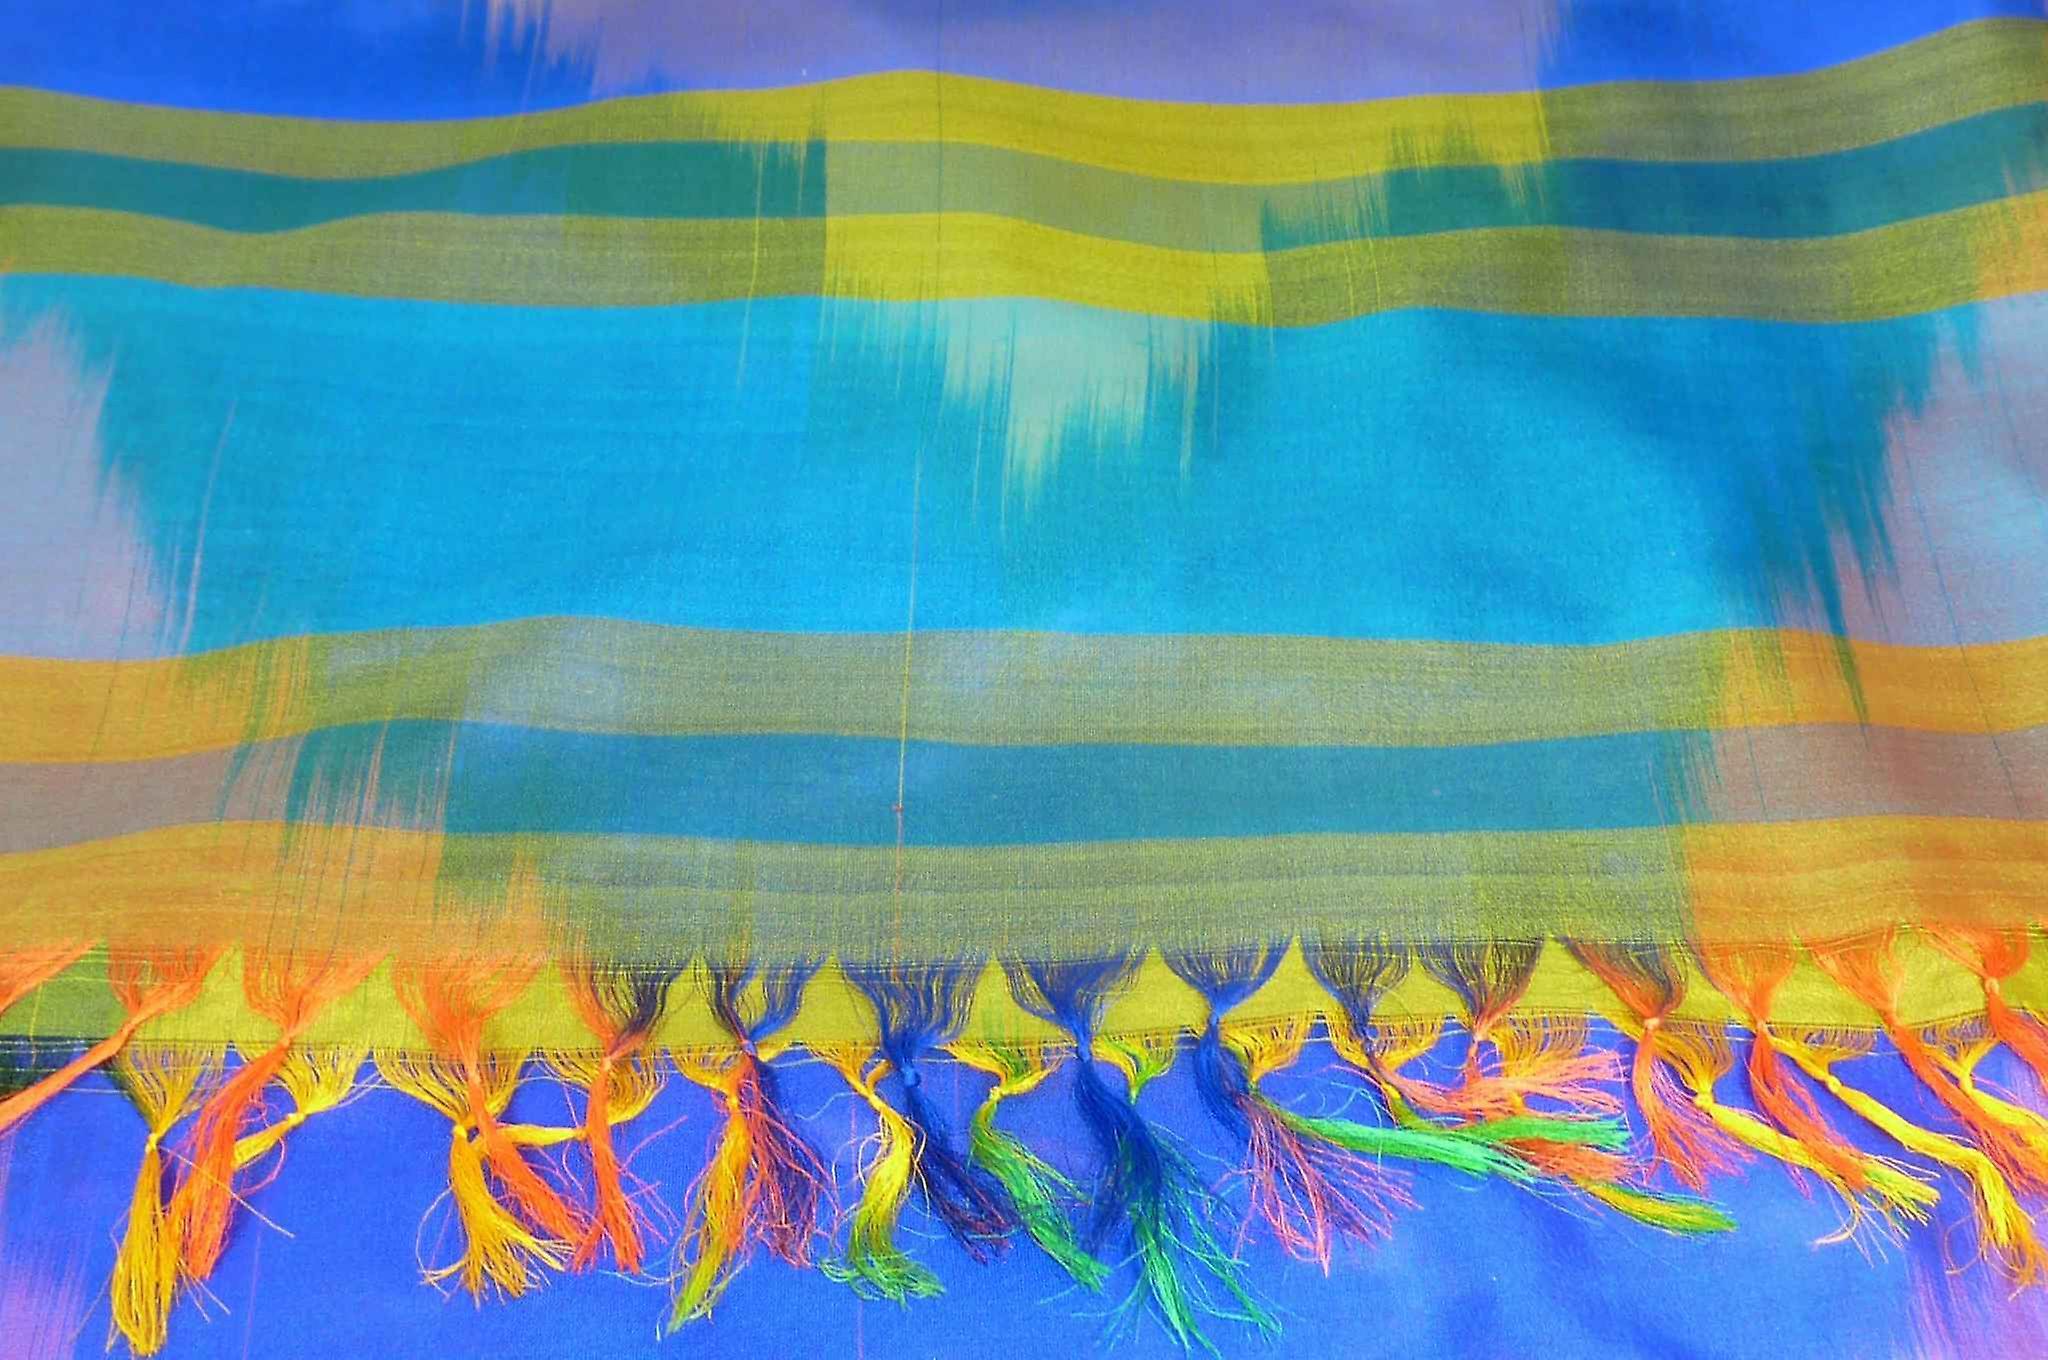 Varanasi Ekal Premium Silk Long Scarf Heritage Range Bharat 6 by Pashmina & Silk